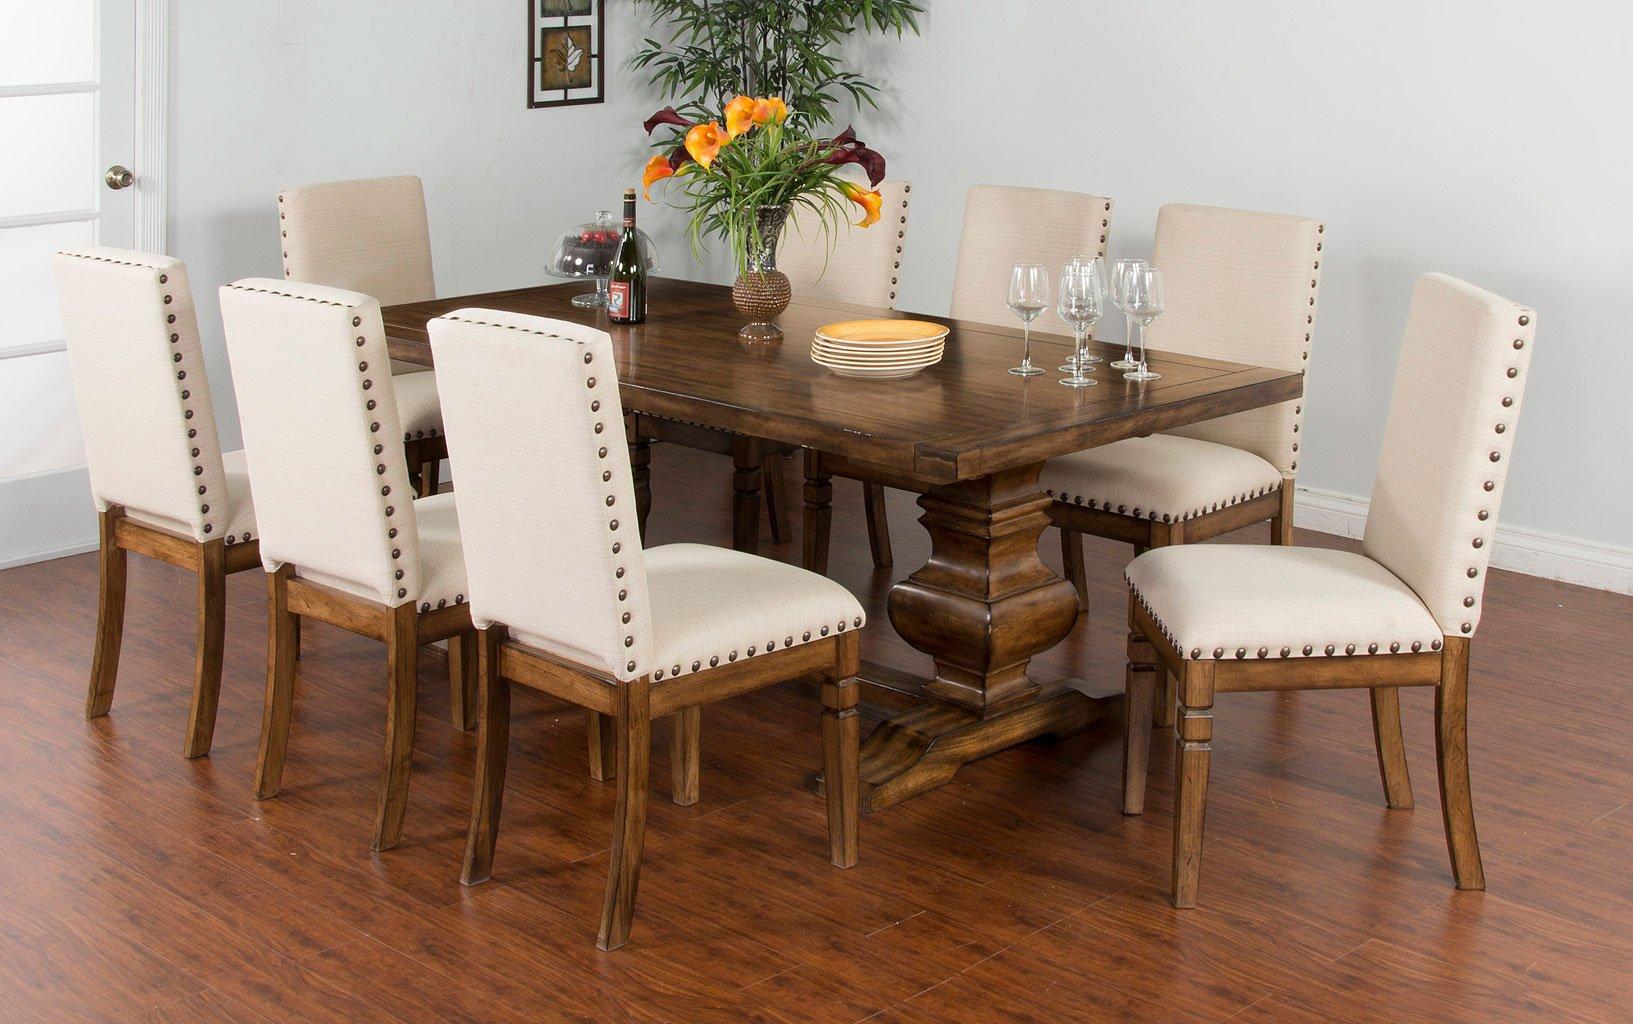 Cornerstone Extension Dining Room Set Sunny Designs ...